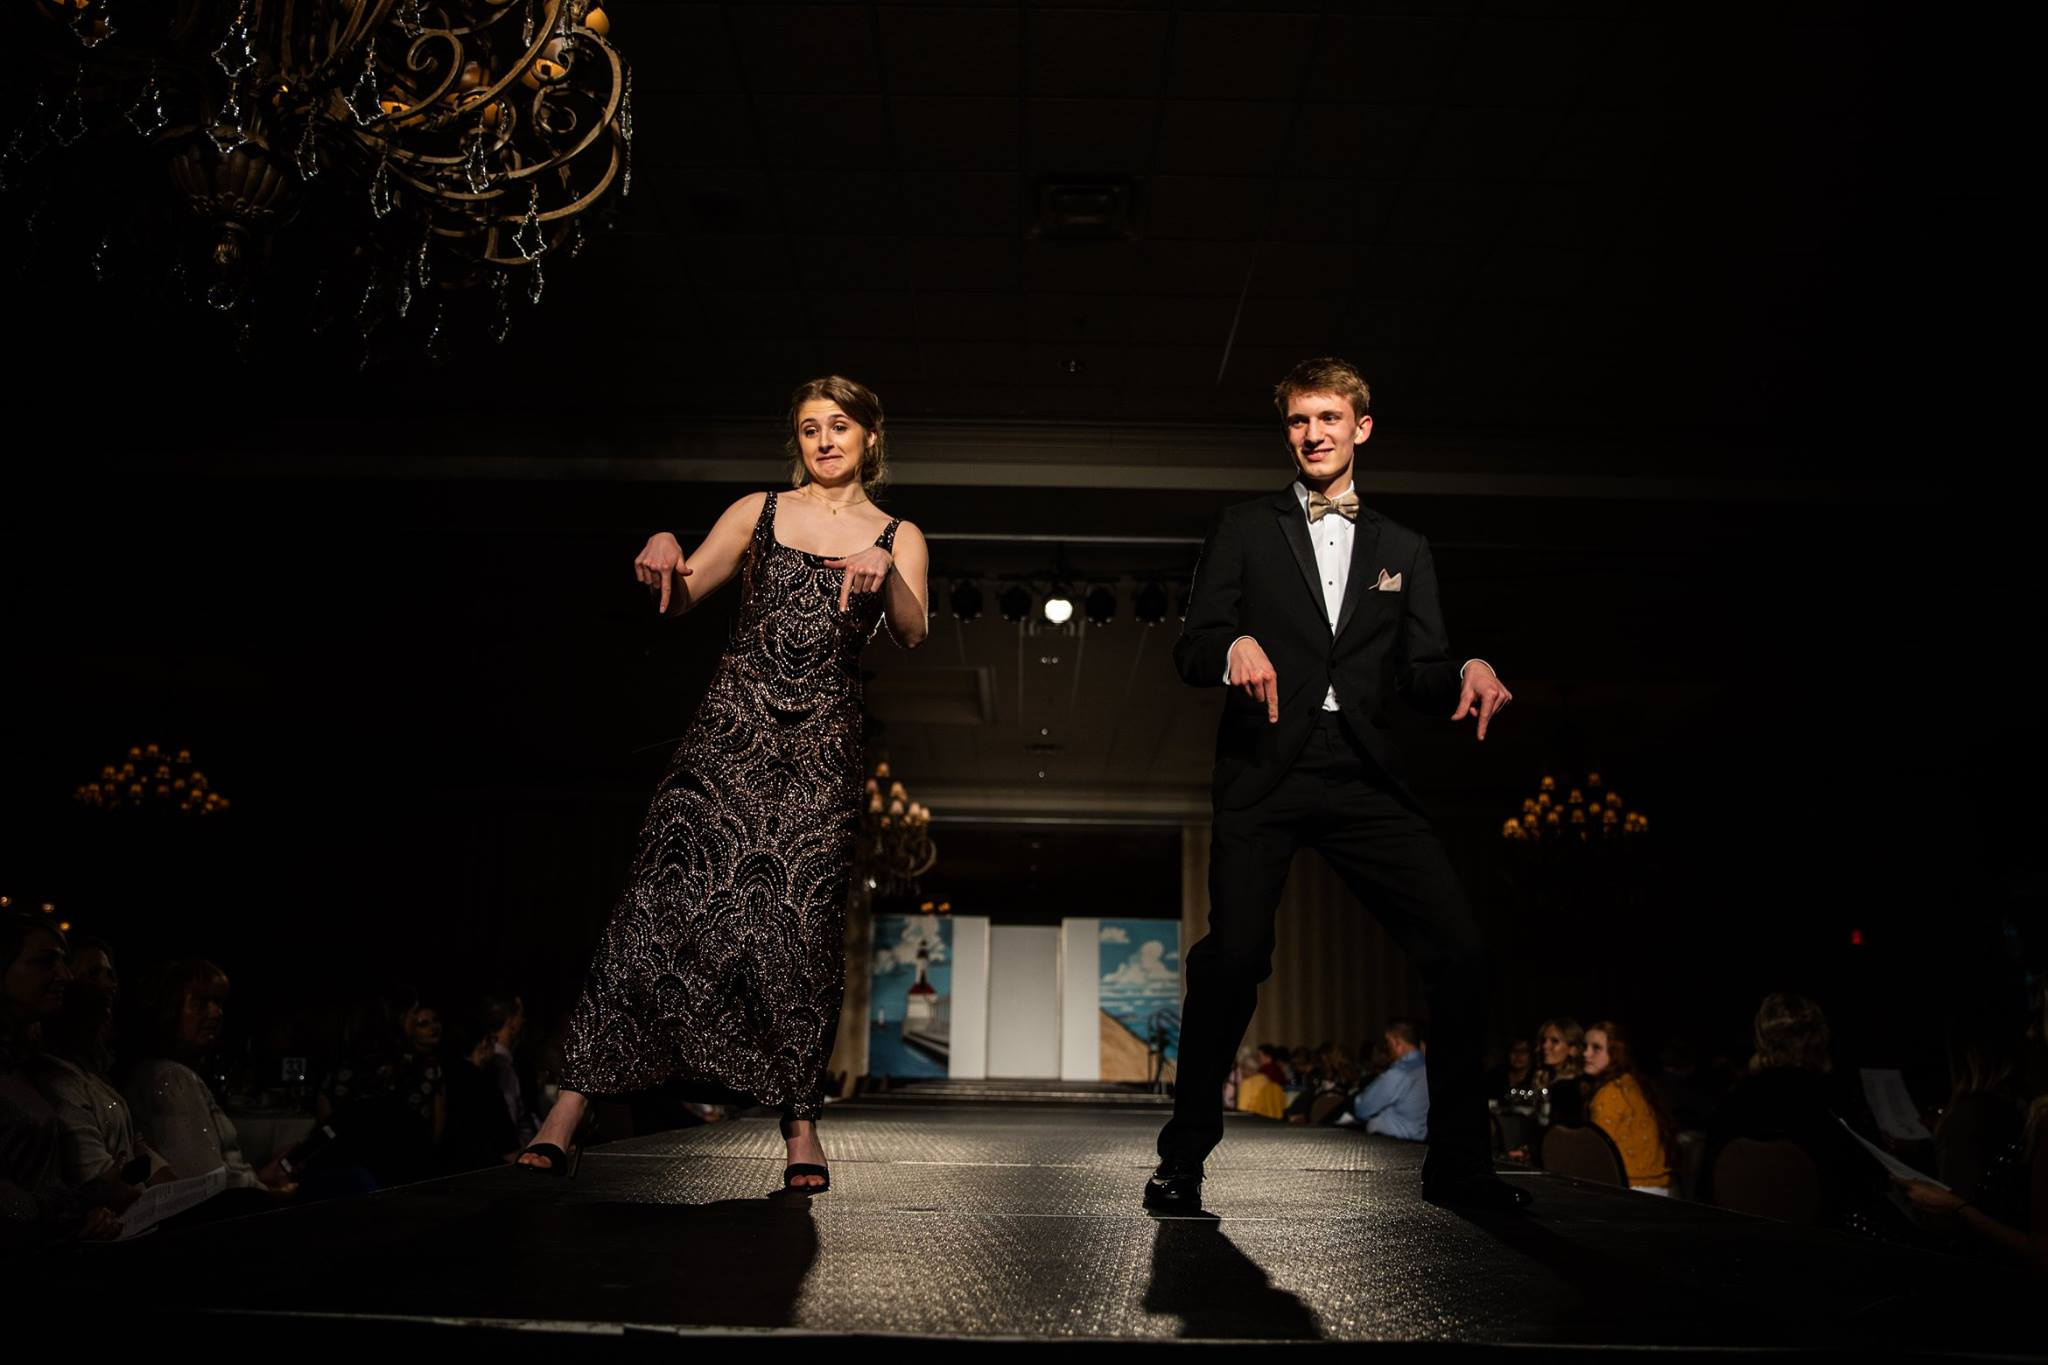 Lutheran_North_High_School_Macomb_Michigan_LHN_Fashion_Show_2019_Seniors (25).jpg